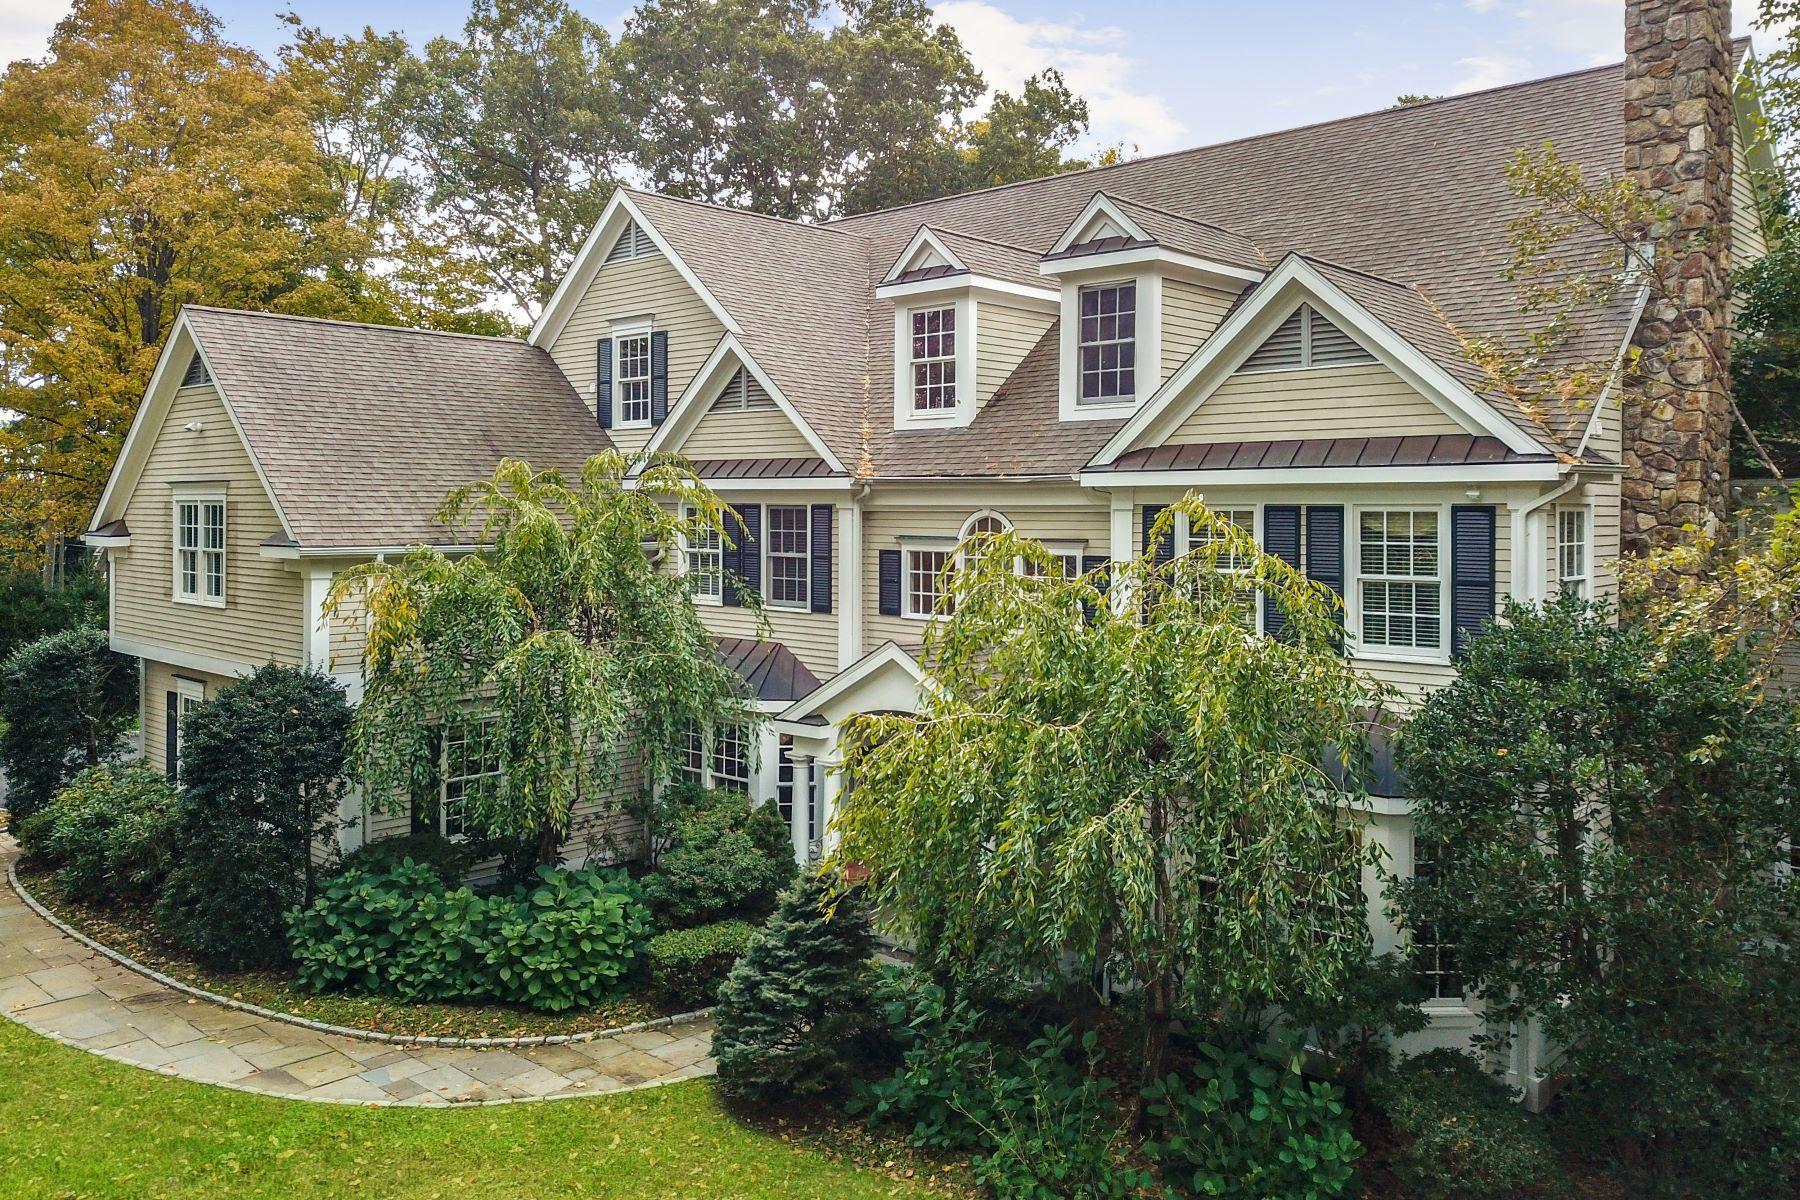 Single Family Home for Sale at 65 Hurlbutt Street 65 Hurlbutt Street Wilton, Connecticut 06897 United States